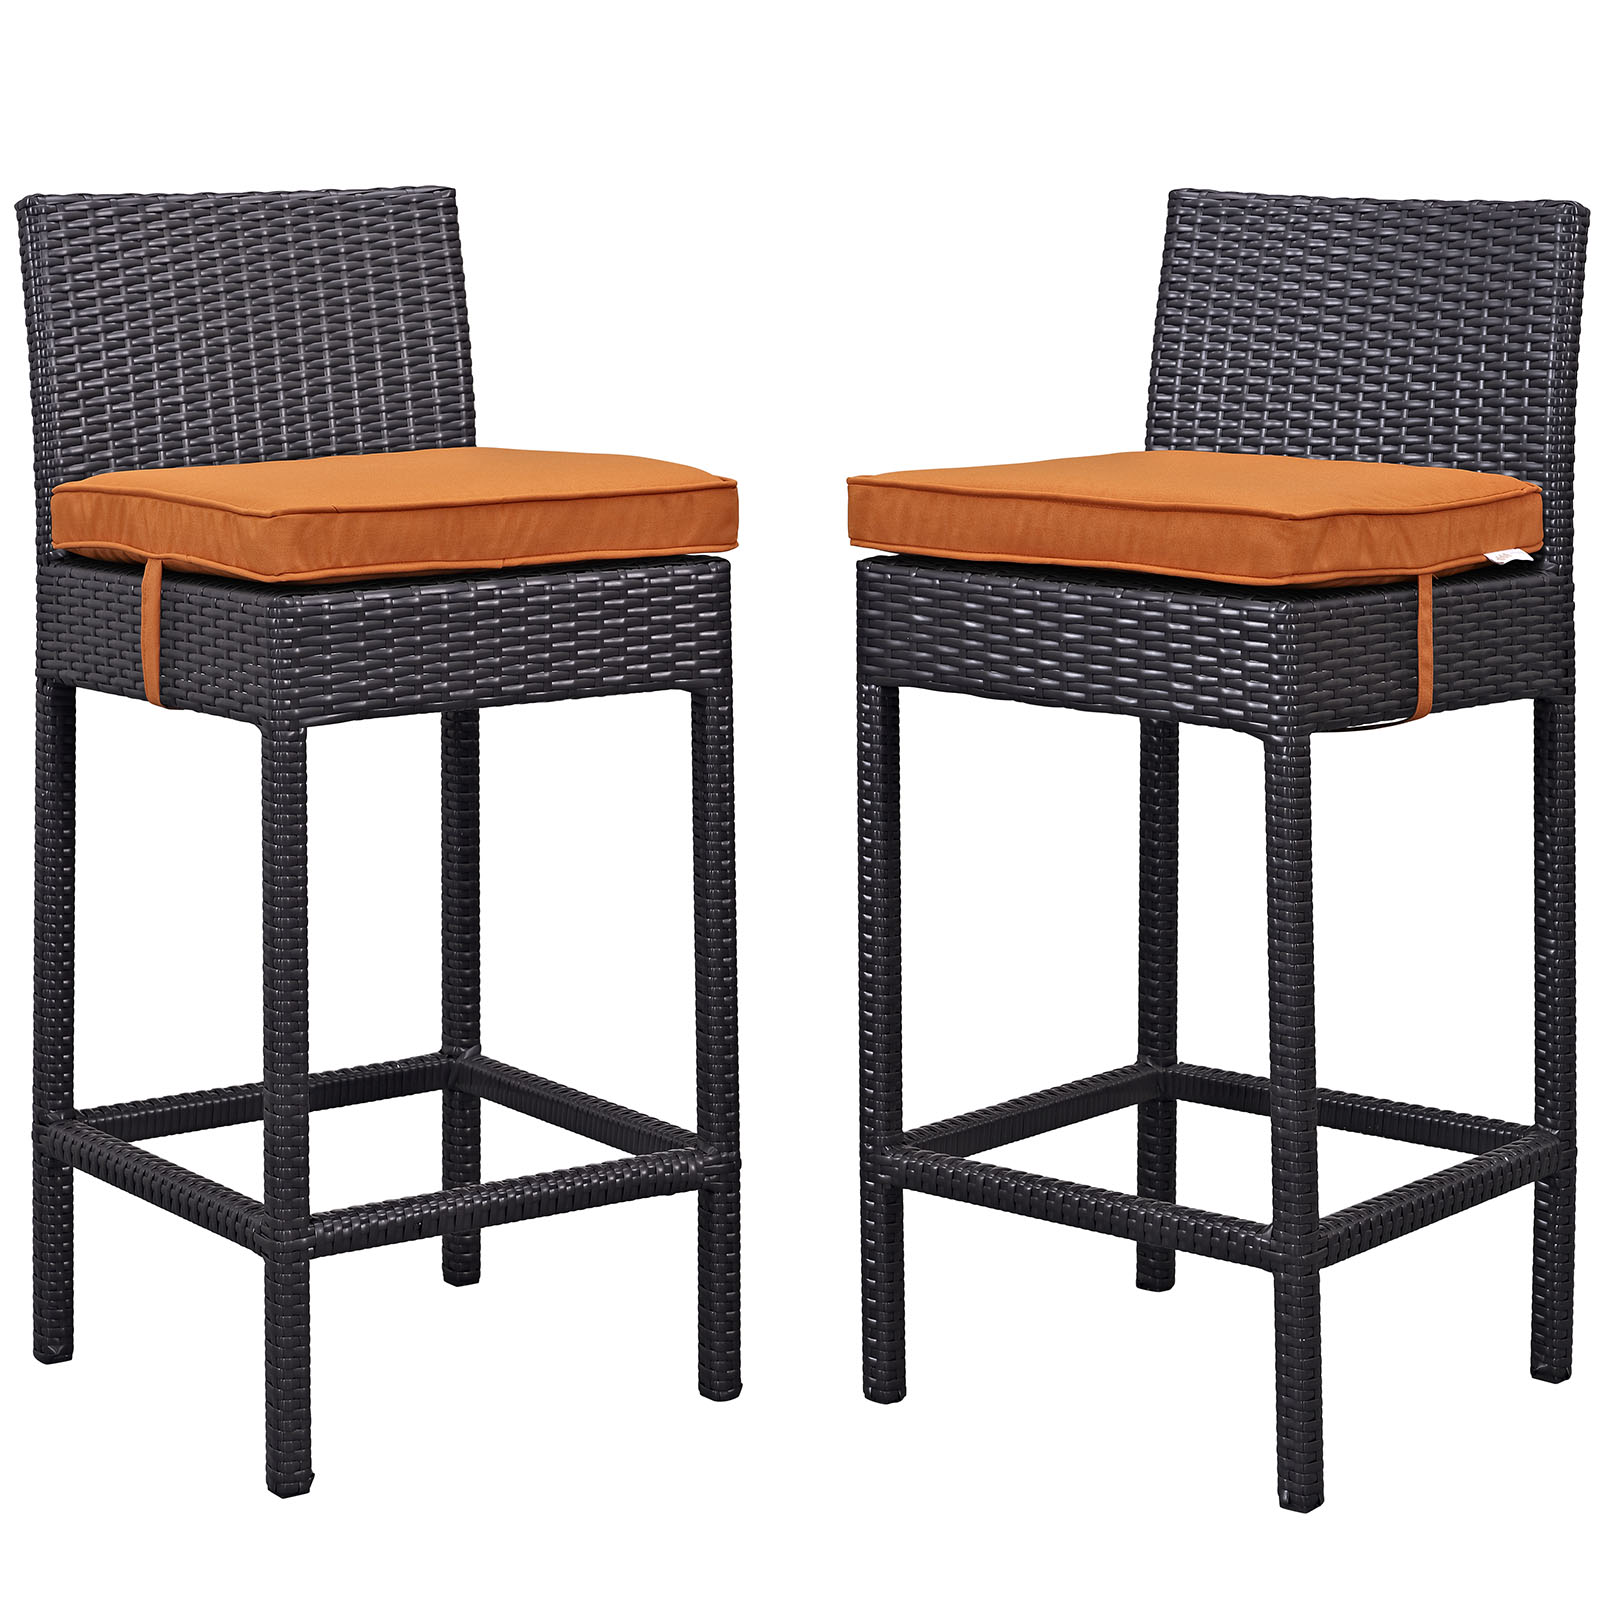 Modern Contemporary Urban Design Outdoor Patio Balcony Bar Stool Chair ( Set of Two), Orange, Rattan